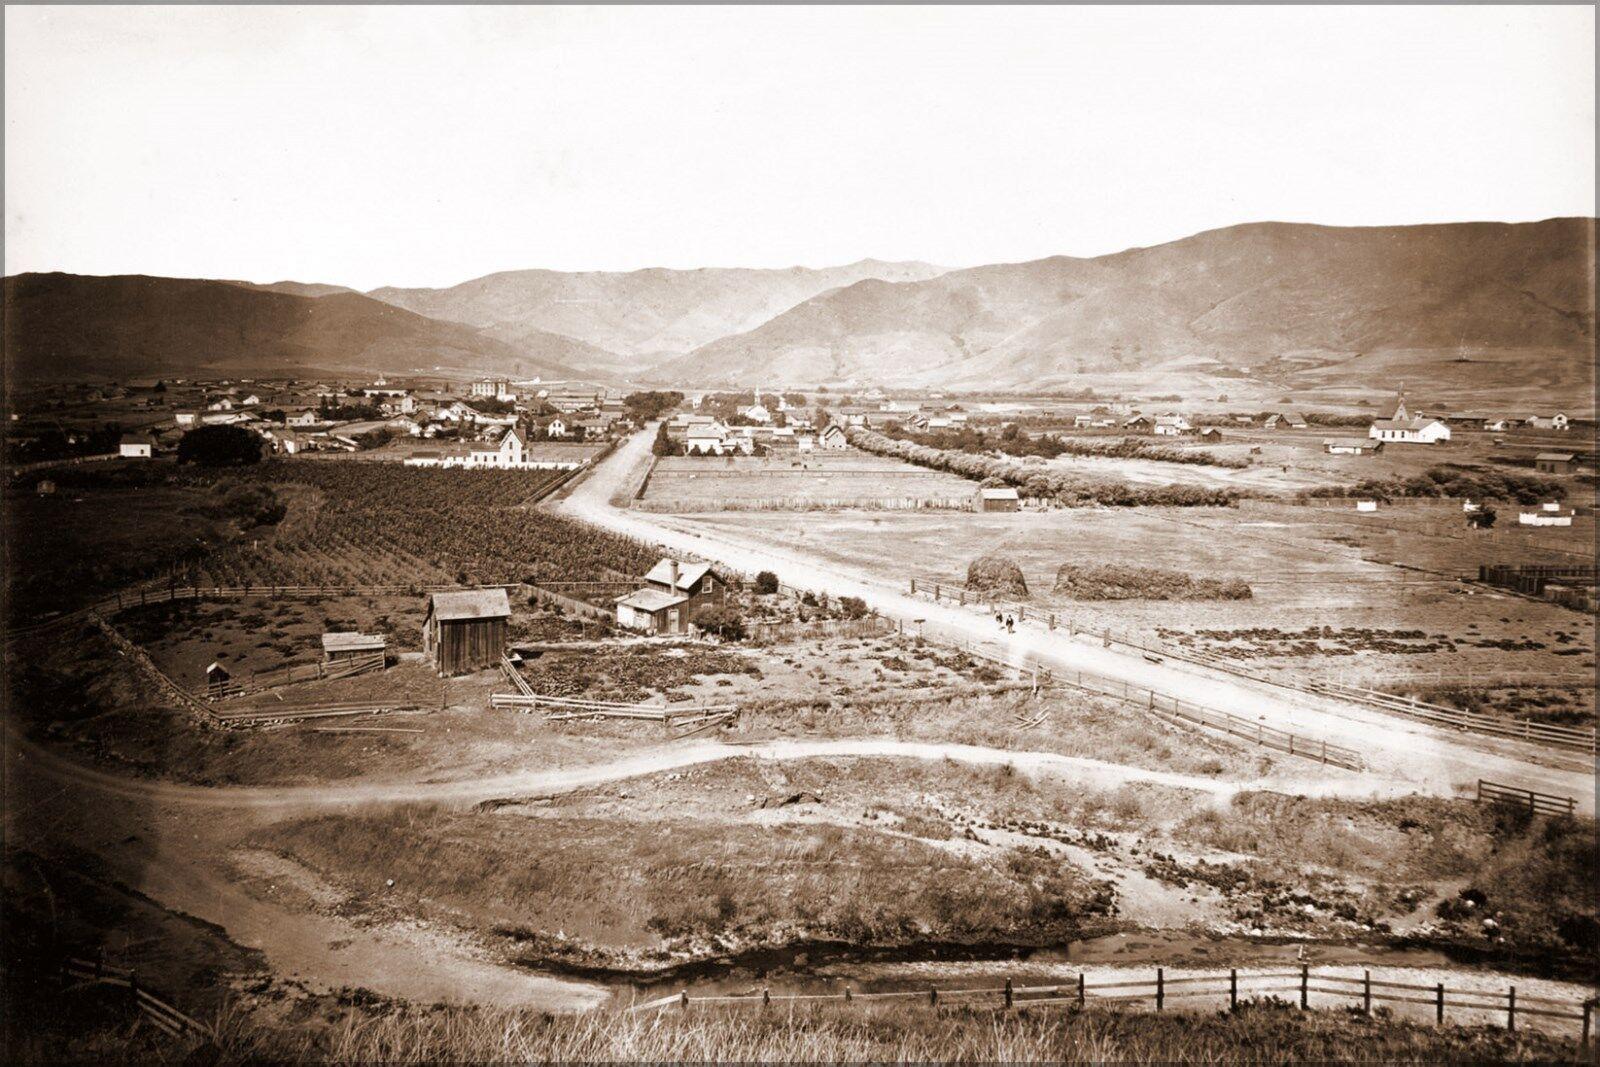 Poster, Poster, Poster, Molte Misure; San Luis Obispo, 1876. Carleton 5f4b6e